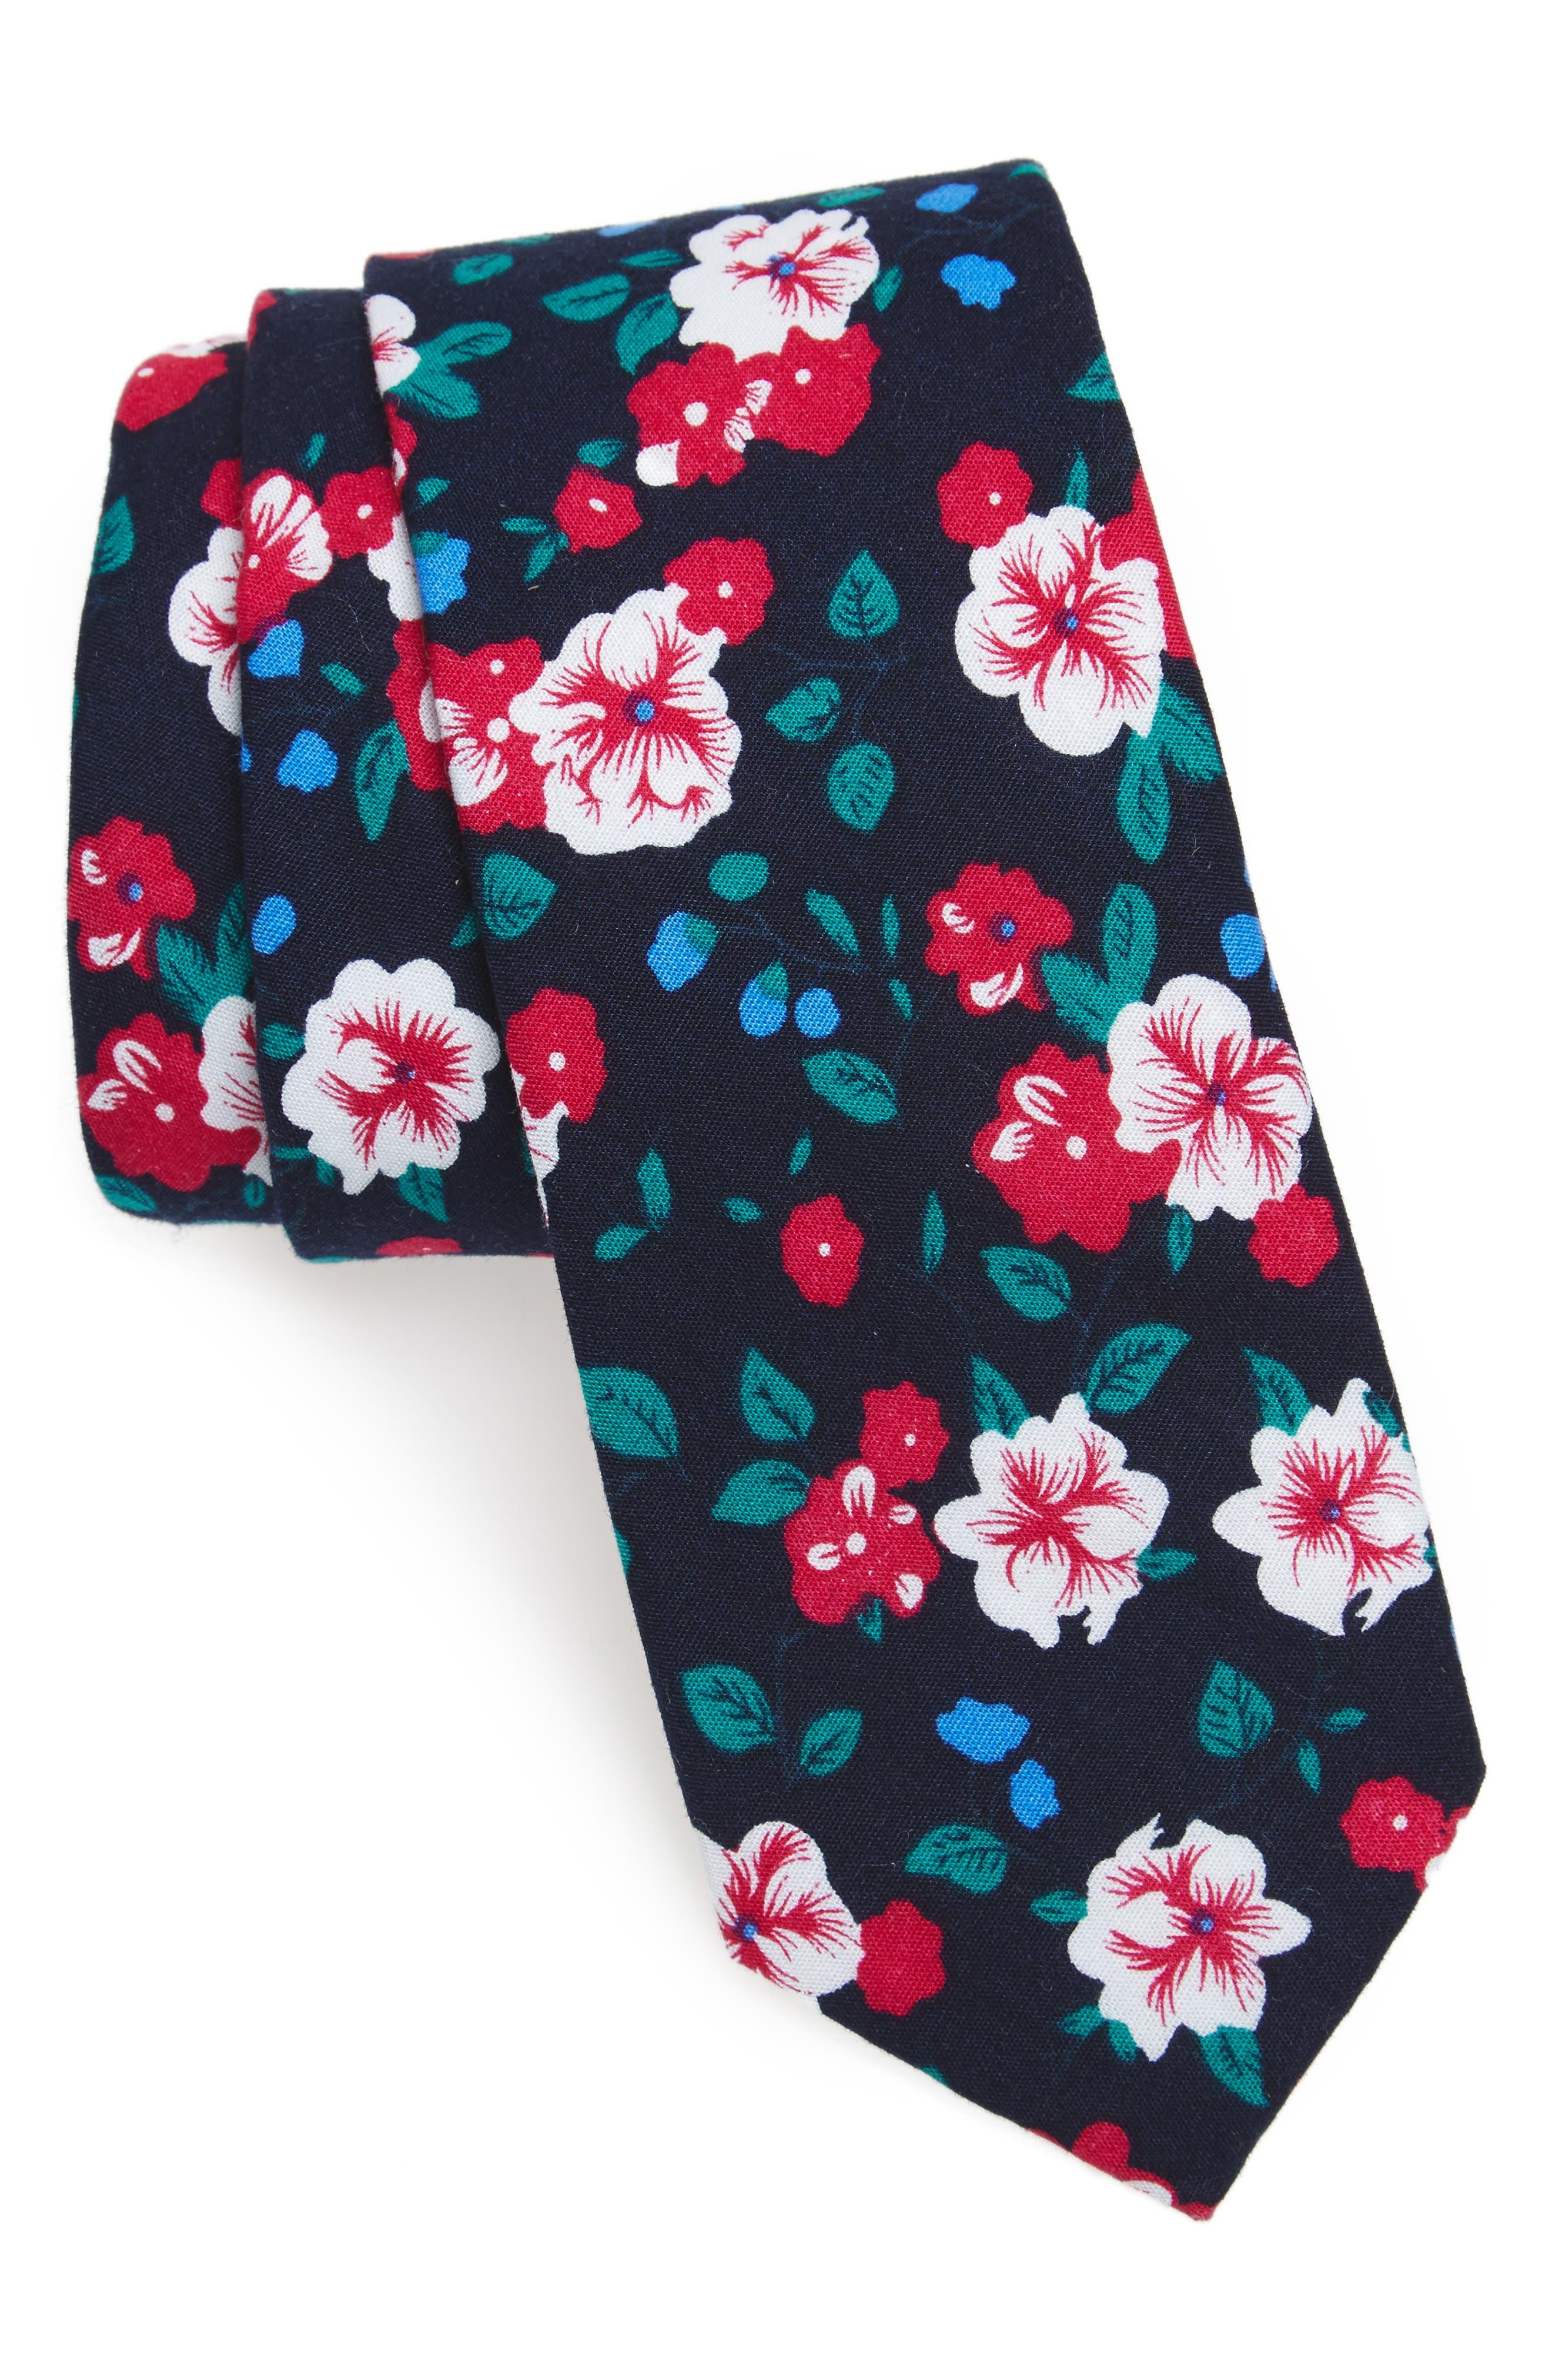 Haruby Floral Print Cotton Skinny Tie,                         Main,                         color, Navy